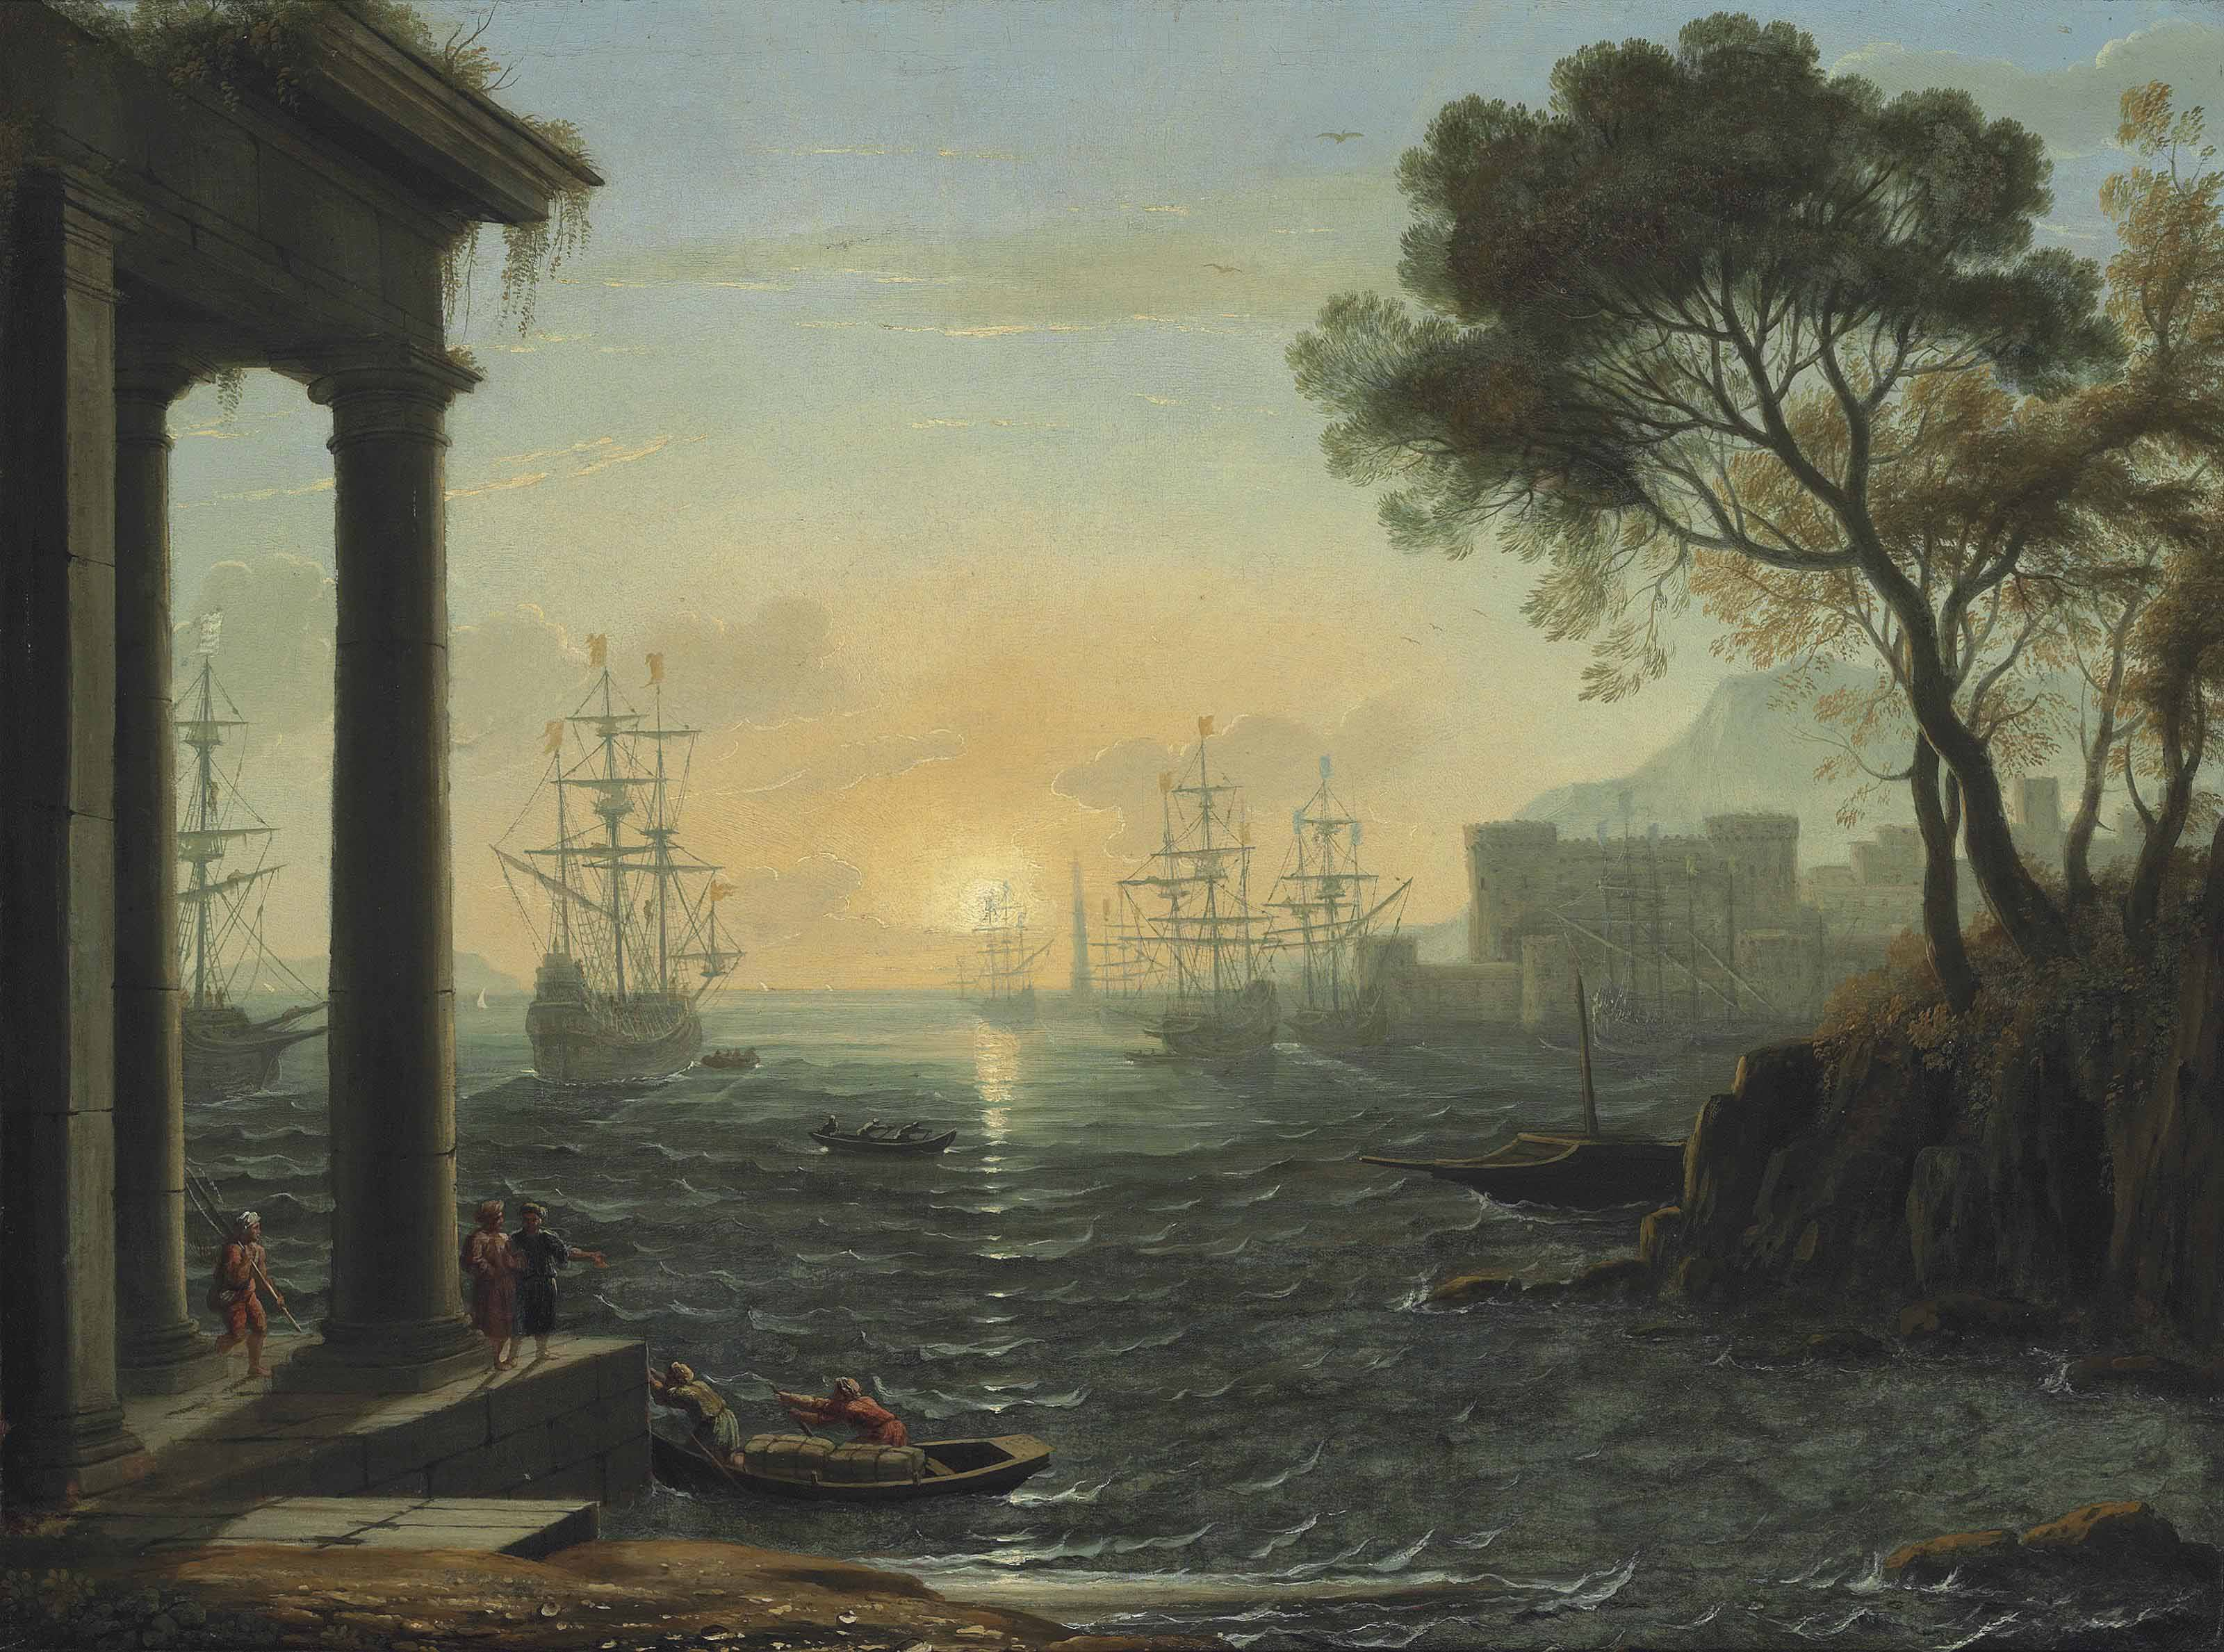 A Mediterranean port at sunset